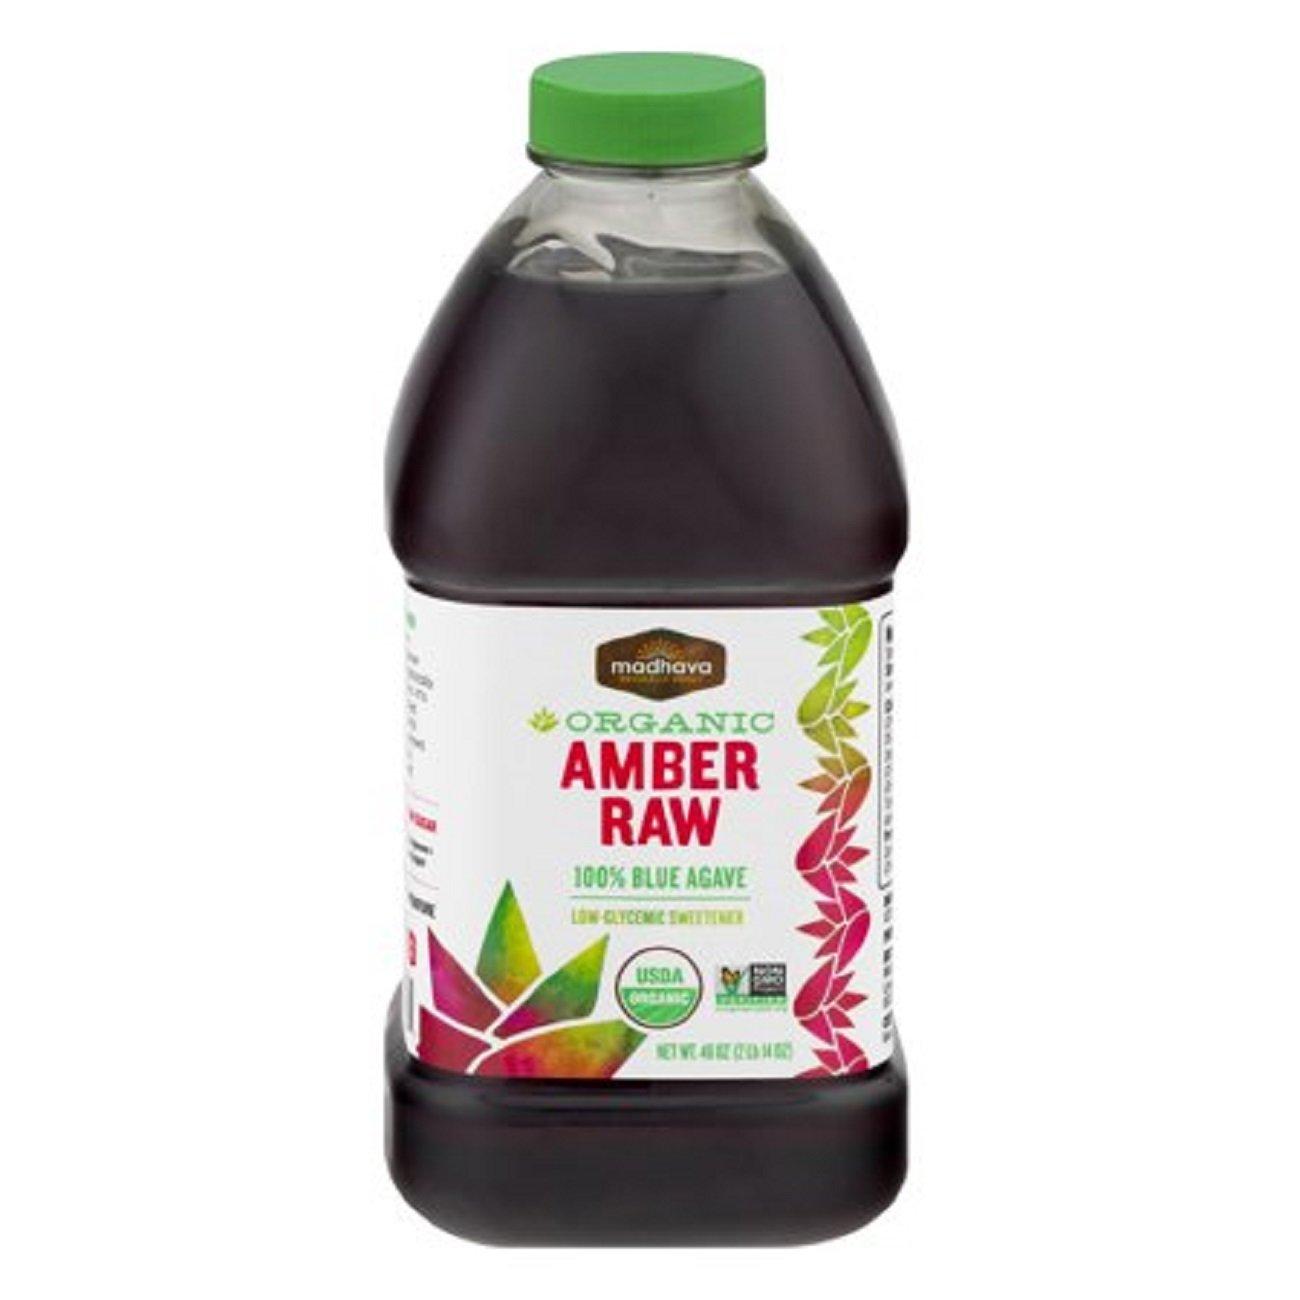 Natural Sweeteners Organic 100% Blue Agave Amber Raw, 46.0 OZ